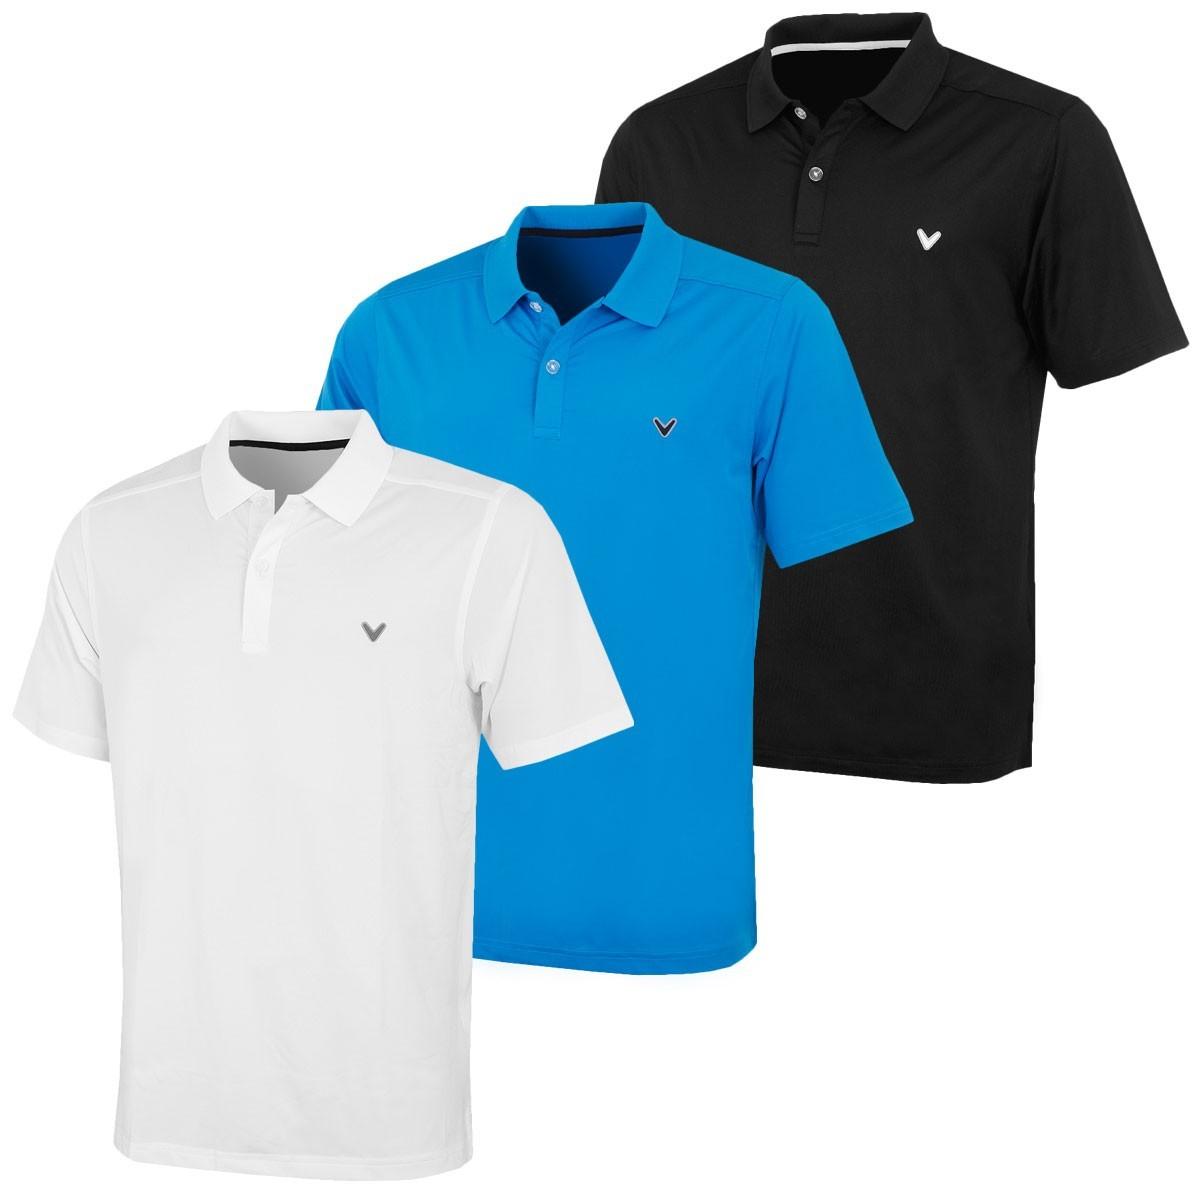 Callaway golf mens performance opti dri polo shirt golf for Personalised golf shirts uk